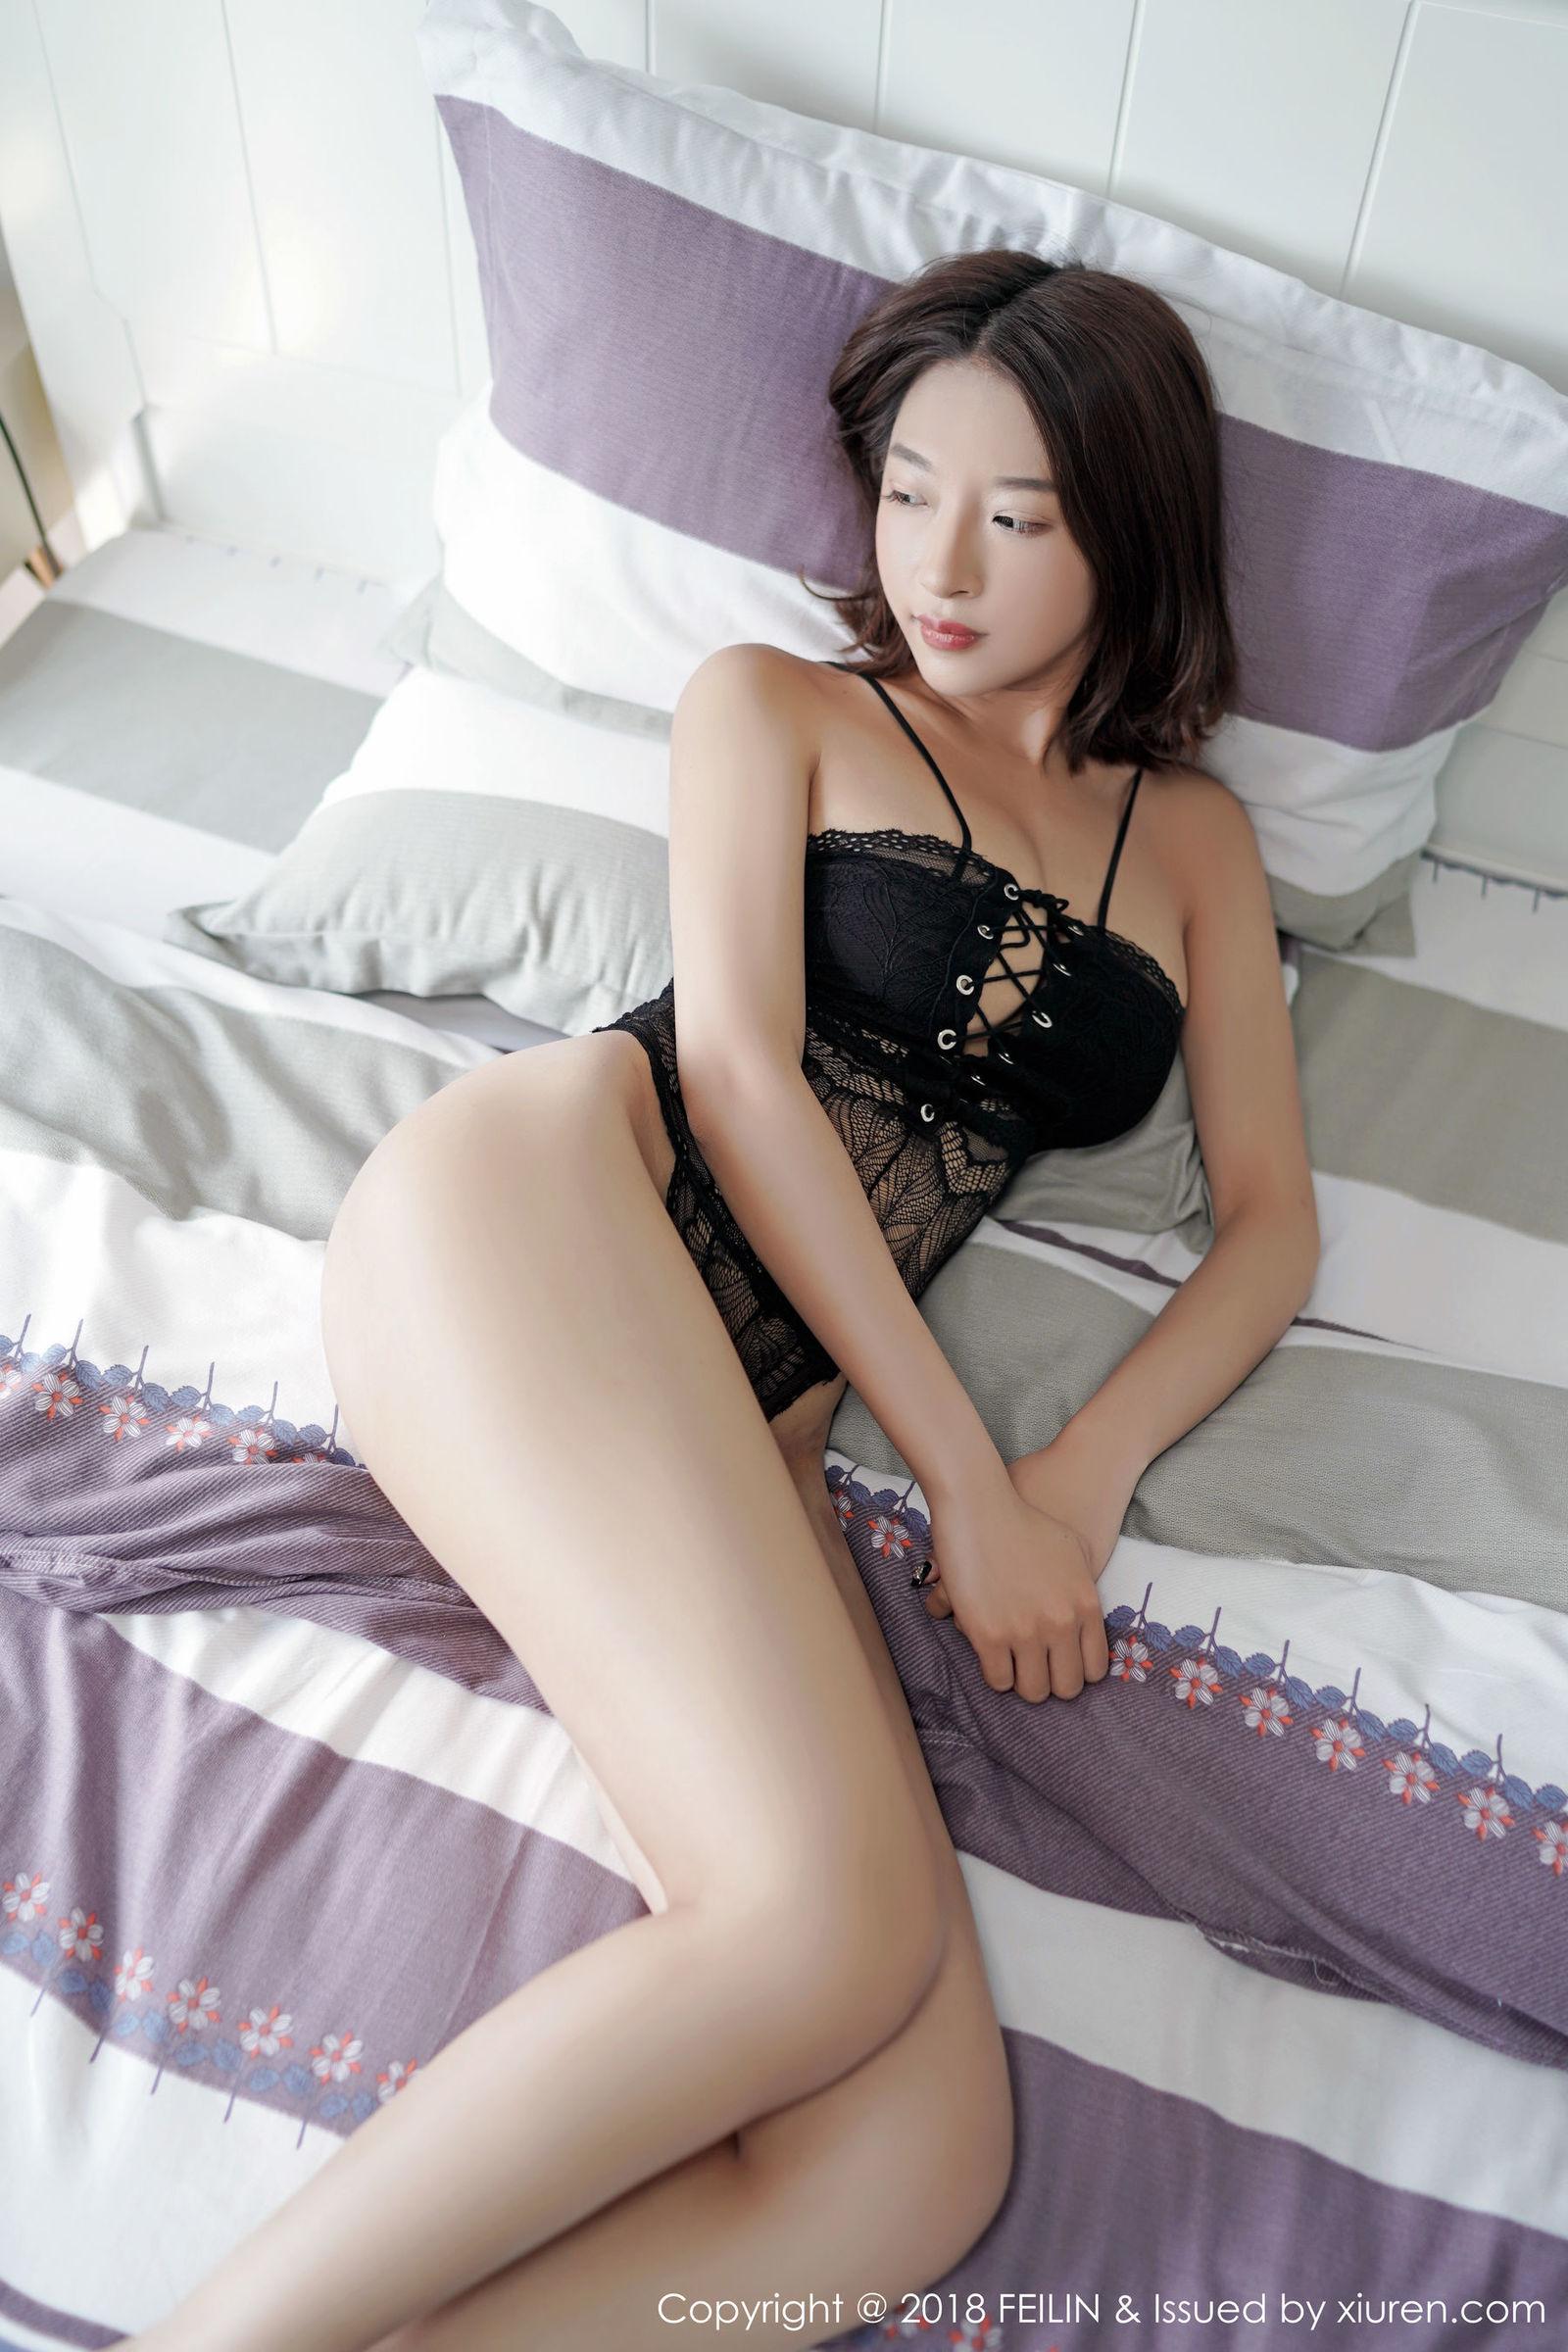 [FEILIN嗲囡囡] VOL.146 栗子Riz - 蕾丝内衣丝袜美图[49P]